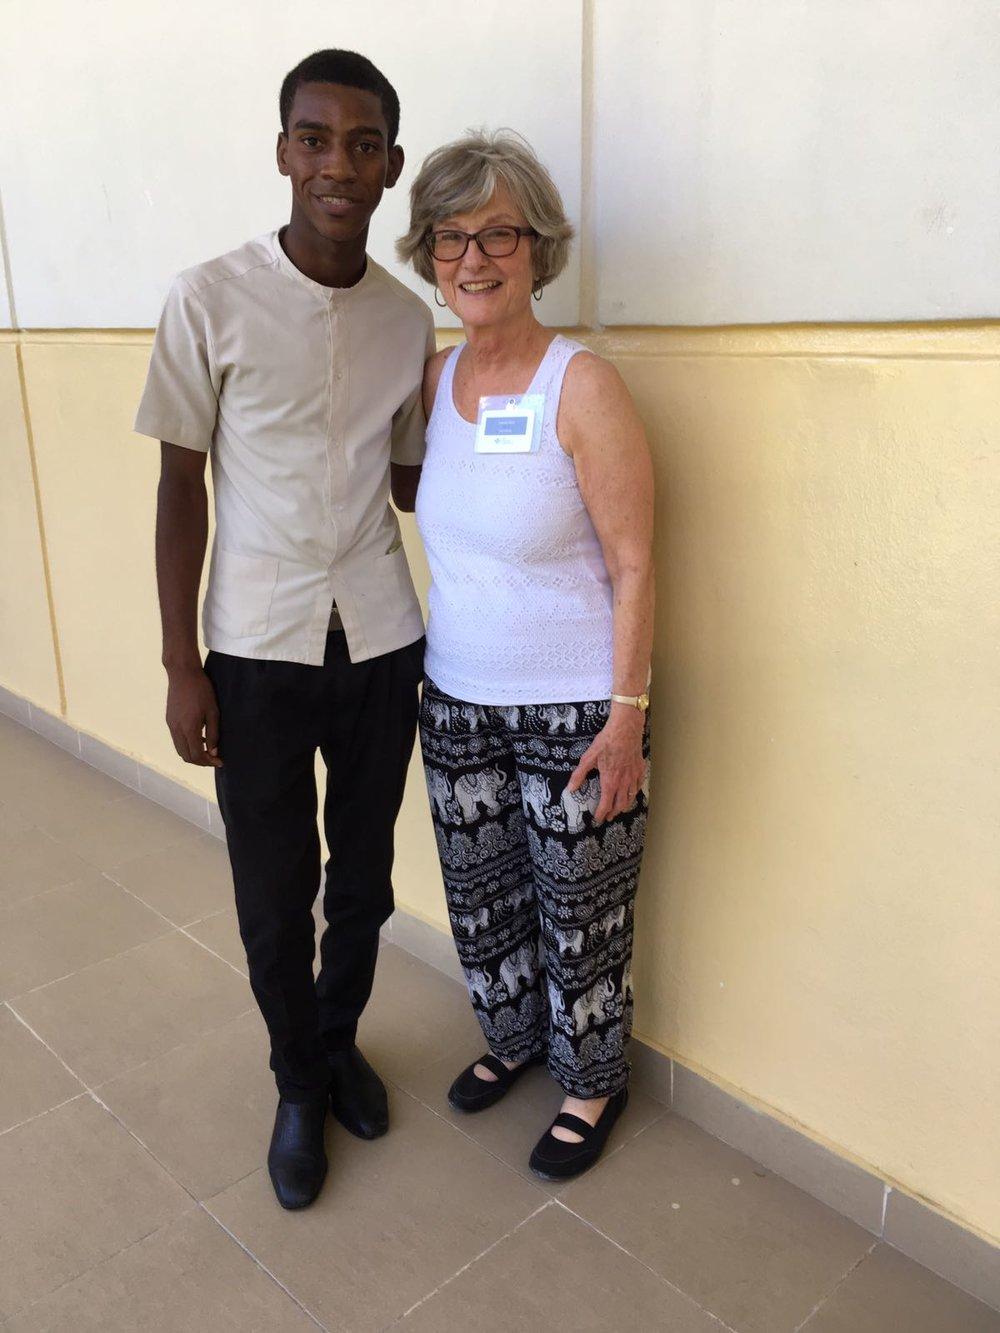 FSIL student, Jacky Joseph, with Joanne Pohl, HNF board president